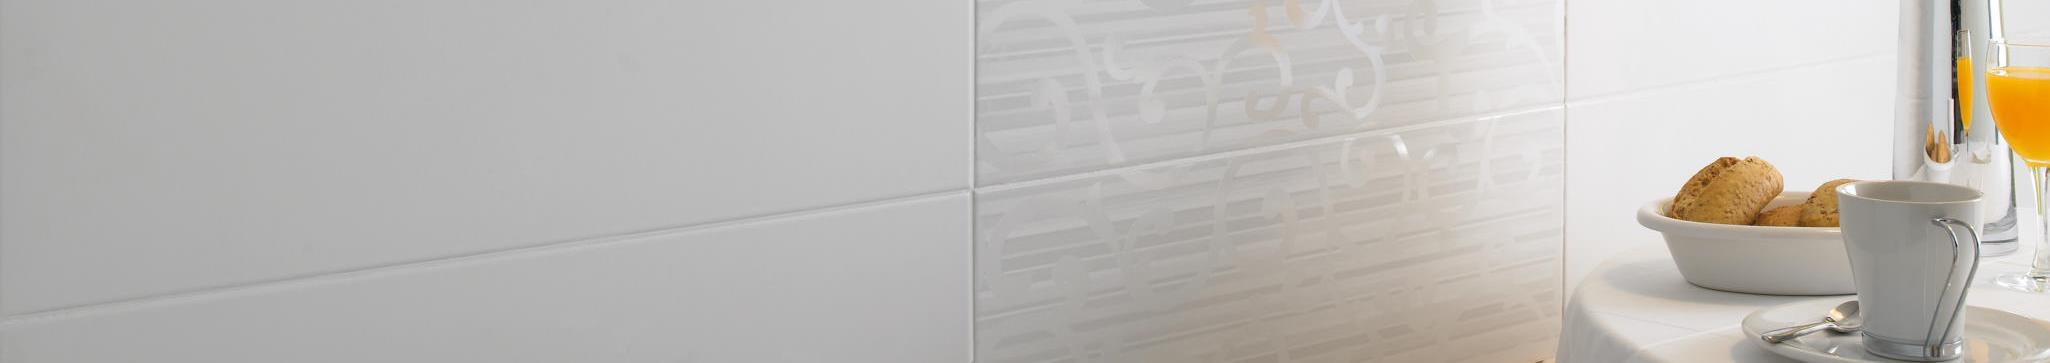 San Diego Marble Tile Team Banner